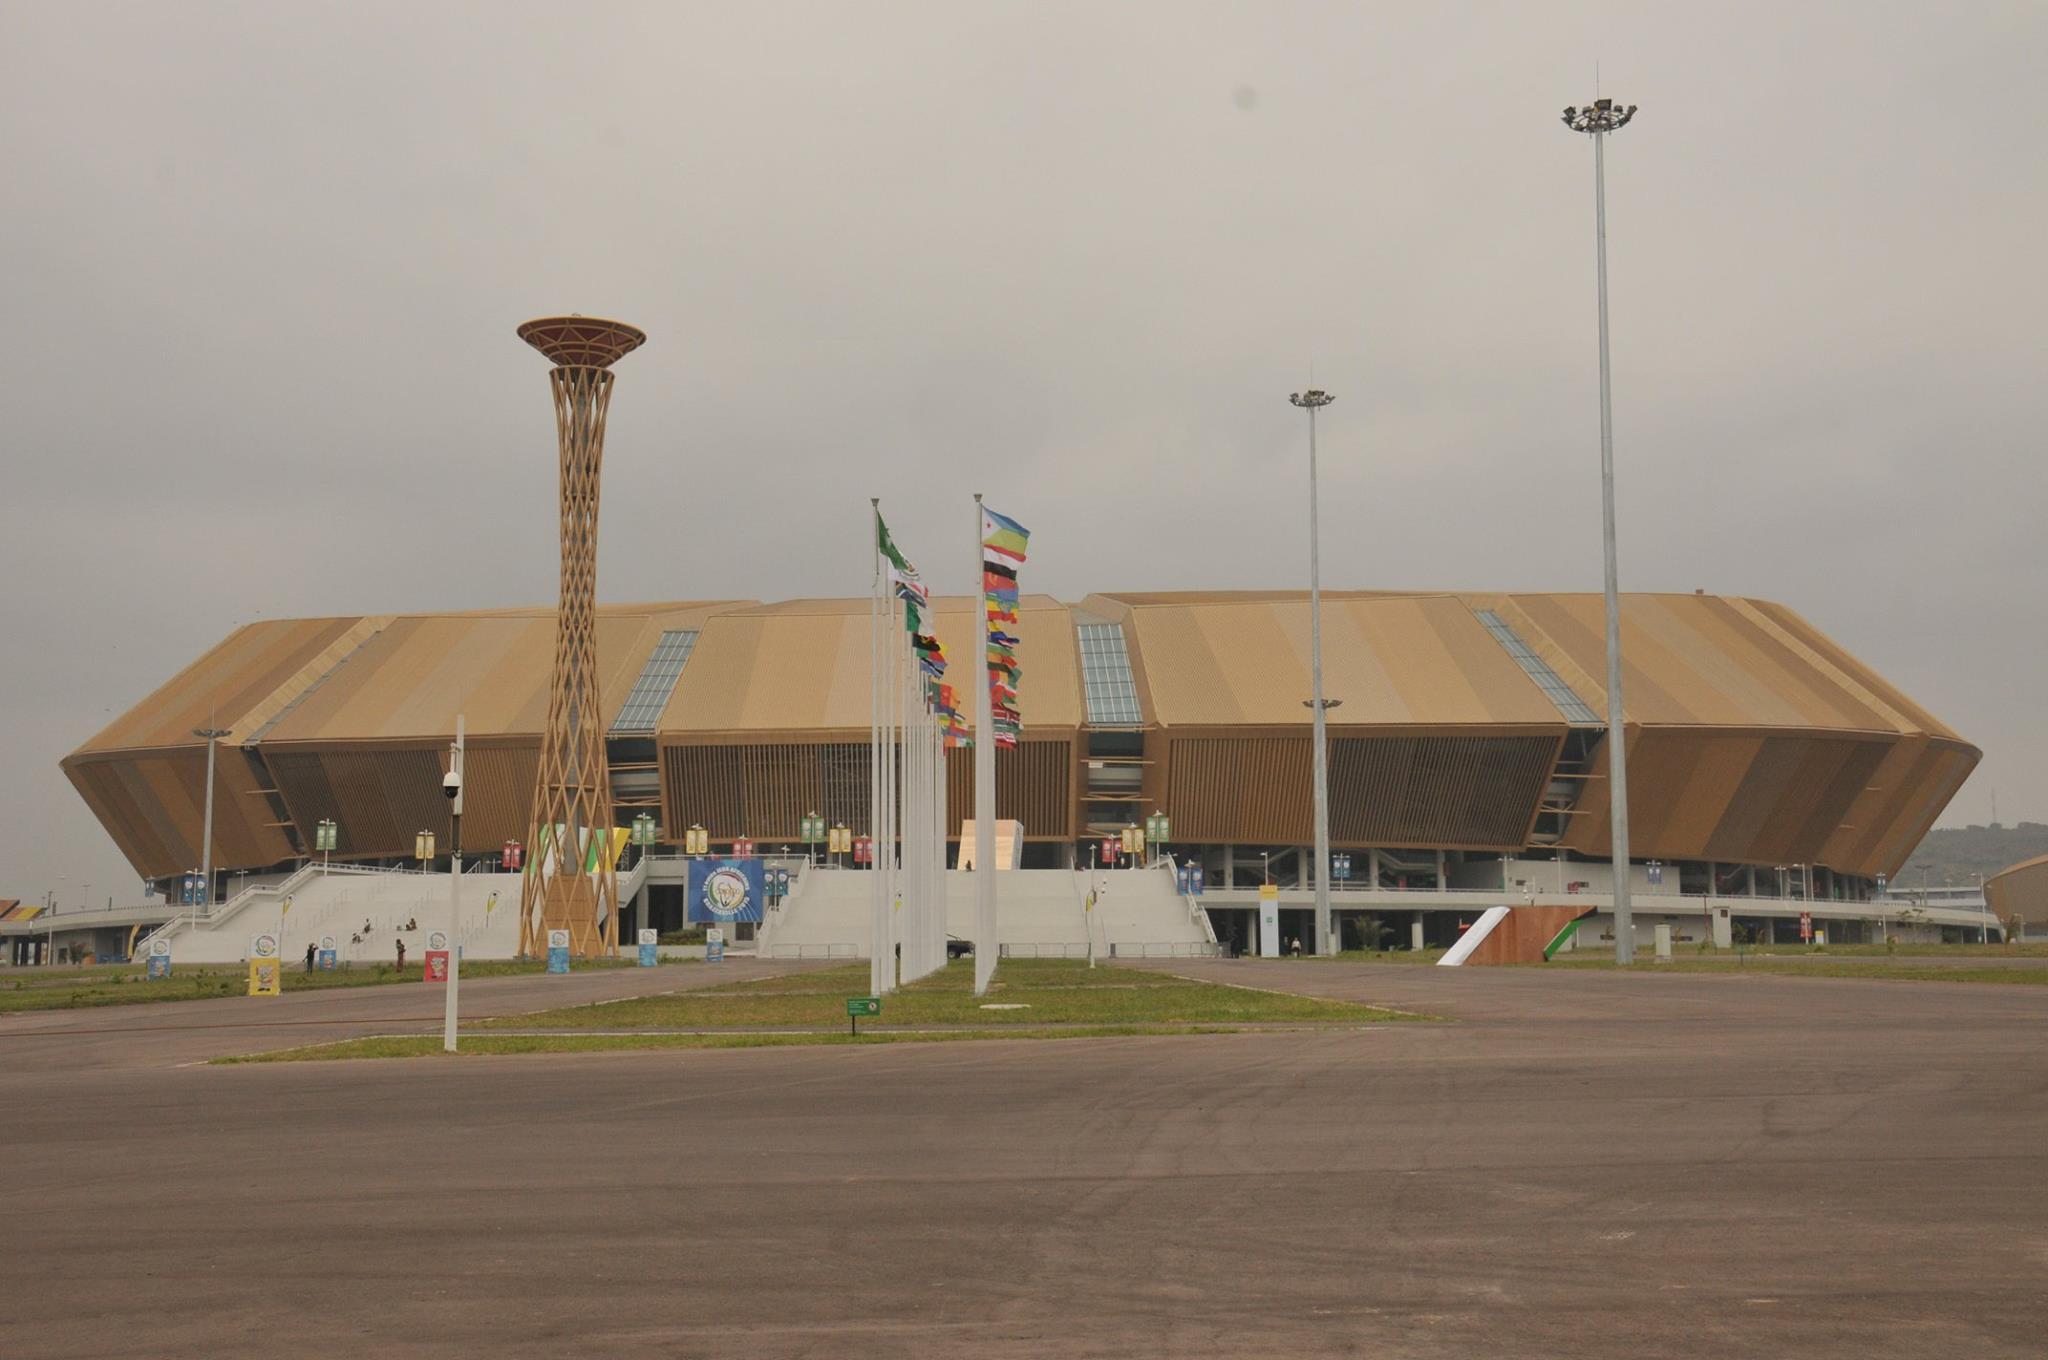 Le Complexe sportif de la Concorde de Kintélé